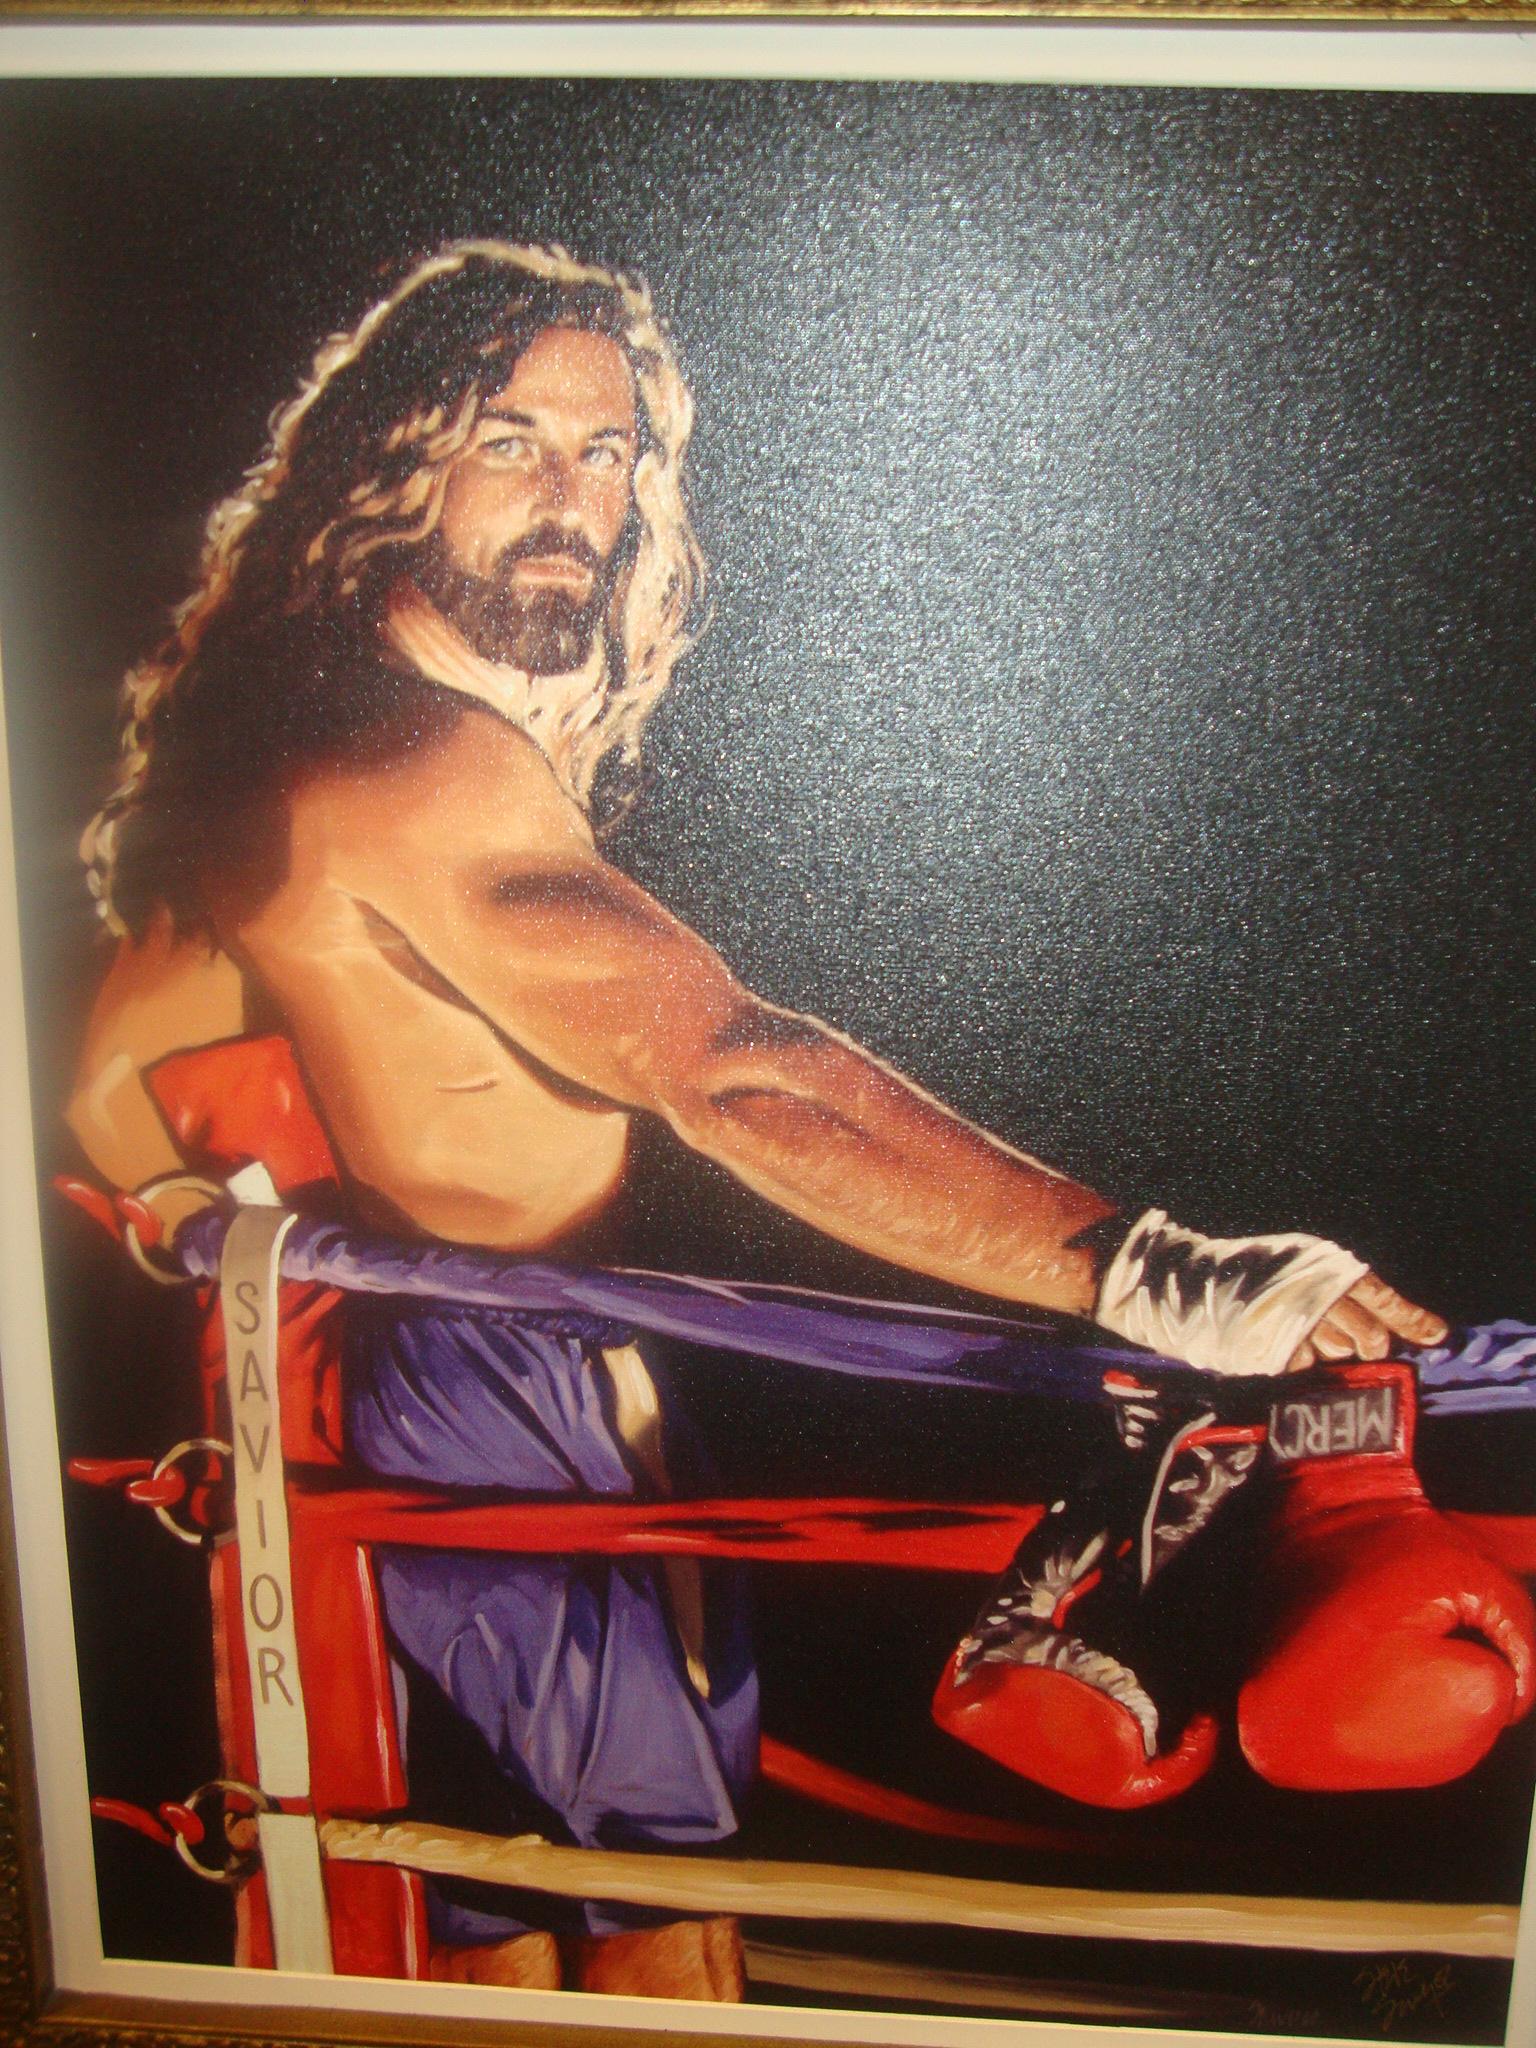 Jesus - KING OF THE RING